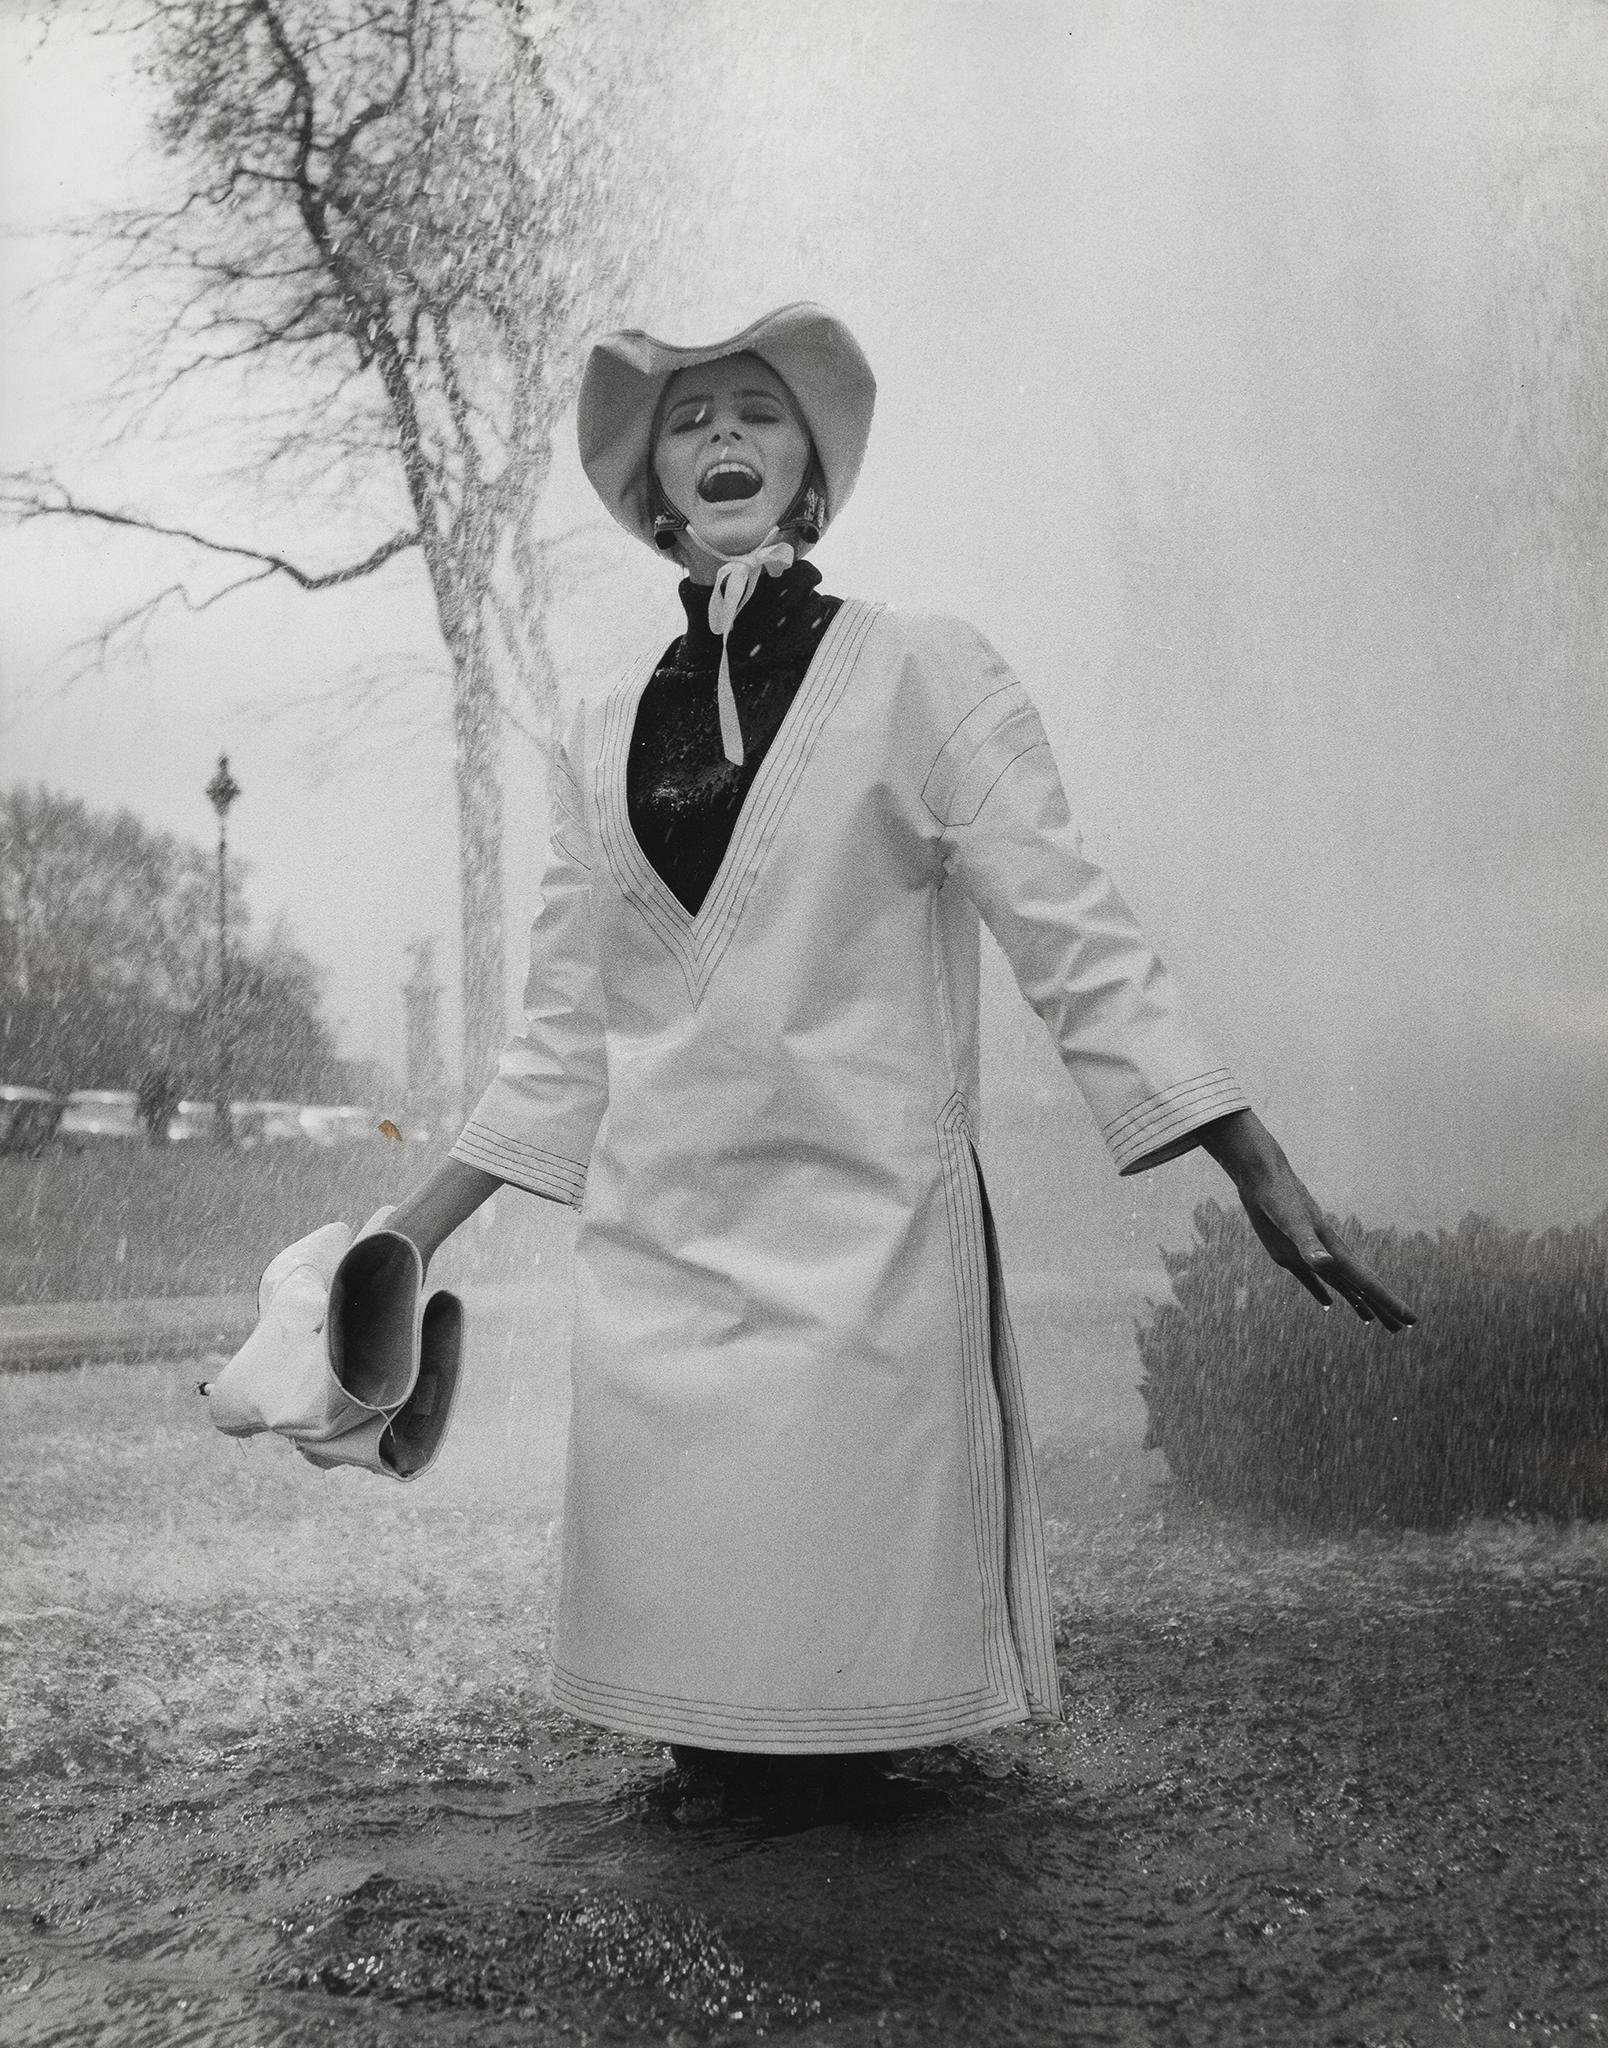 Mary Quant retrospective celebrates the life of a fashion